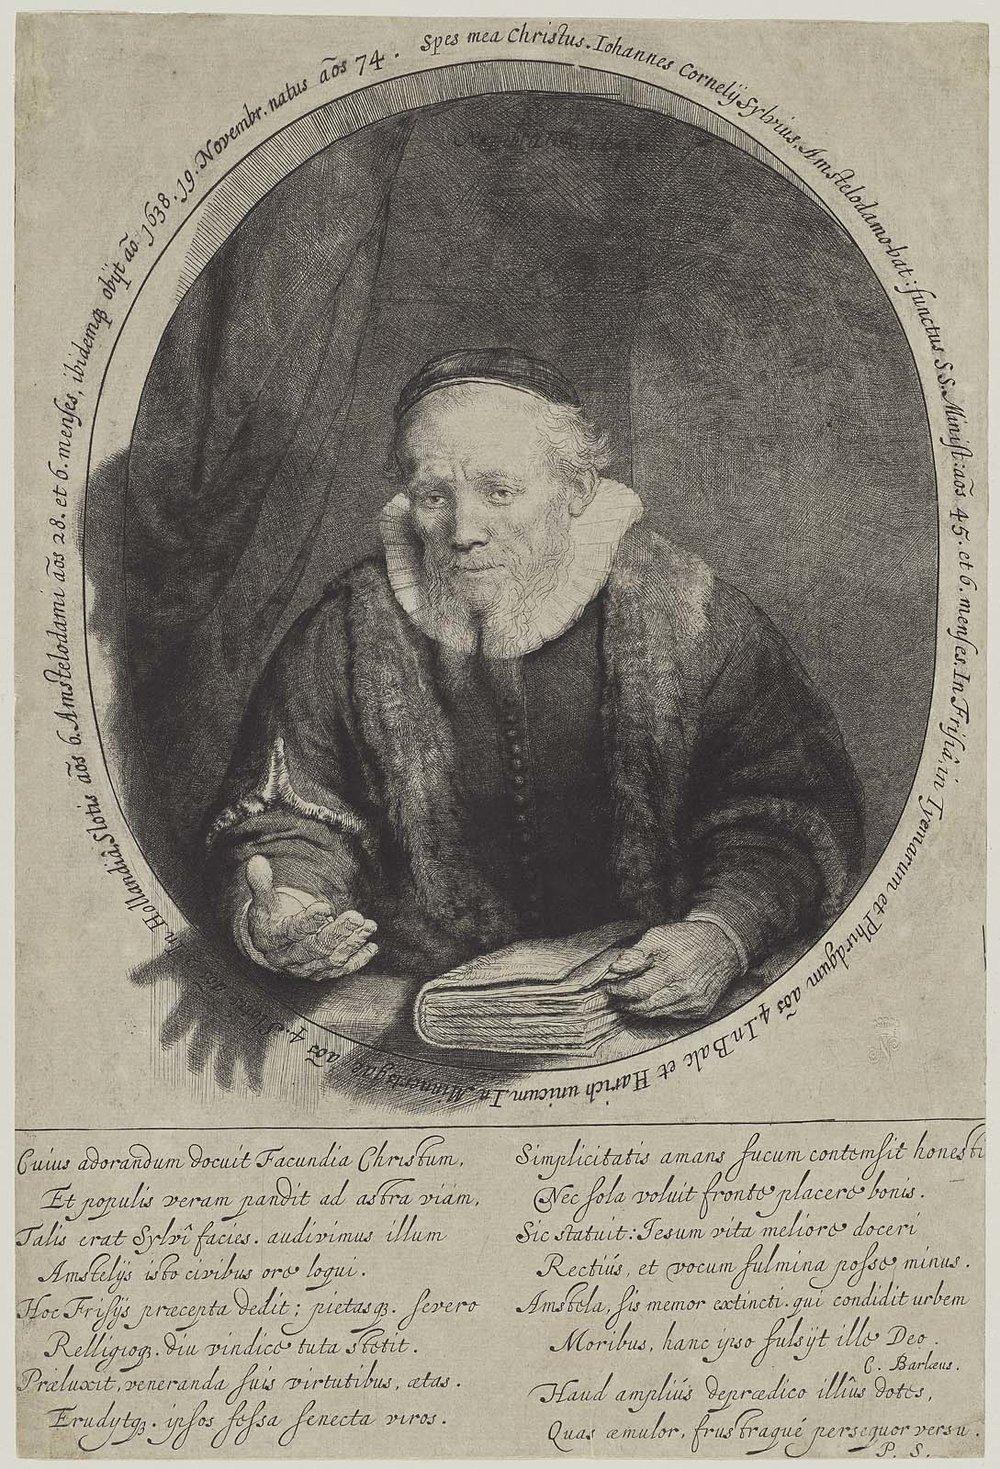 Jan Cornelis Sylvius, Preacher (1646) by Rembrandt van Rijn   PC: mfa.org